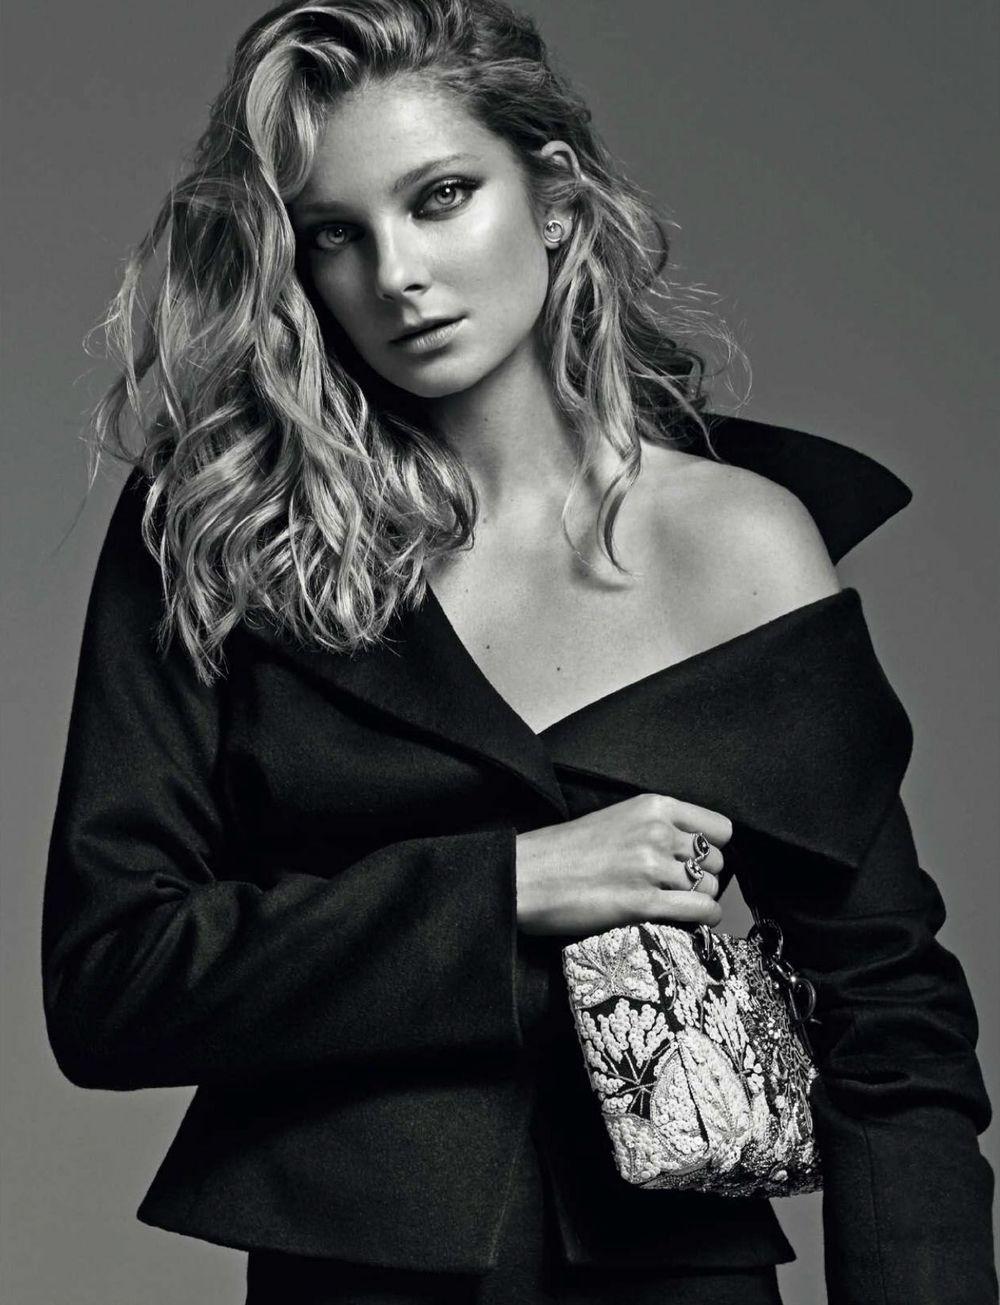 Nuevos Iconos: Eniko Mihalik by Xavi Gordo for Elle Spain September 2016 - Dior Fall 2016